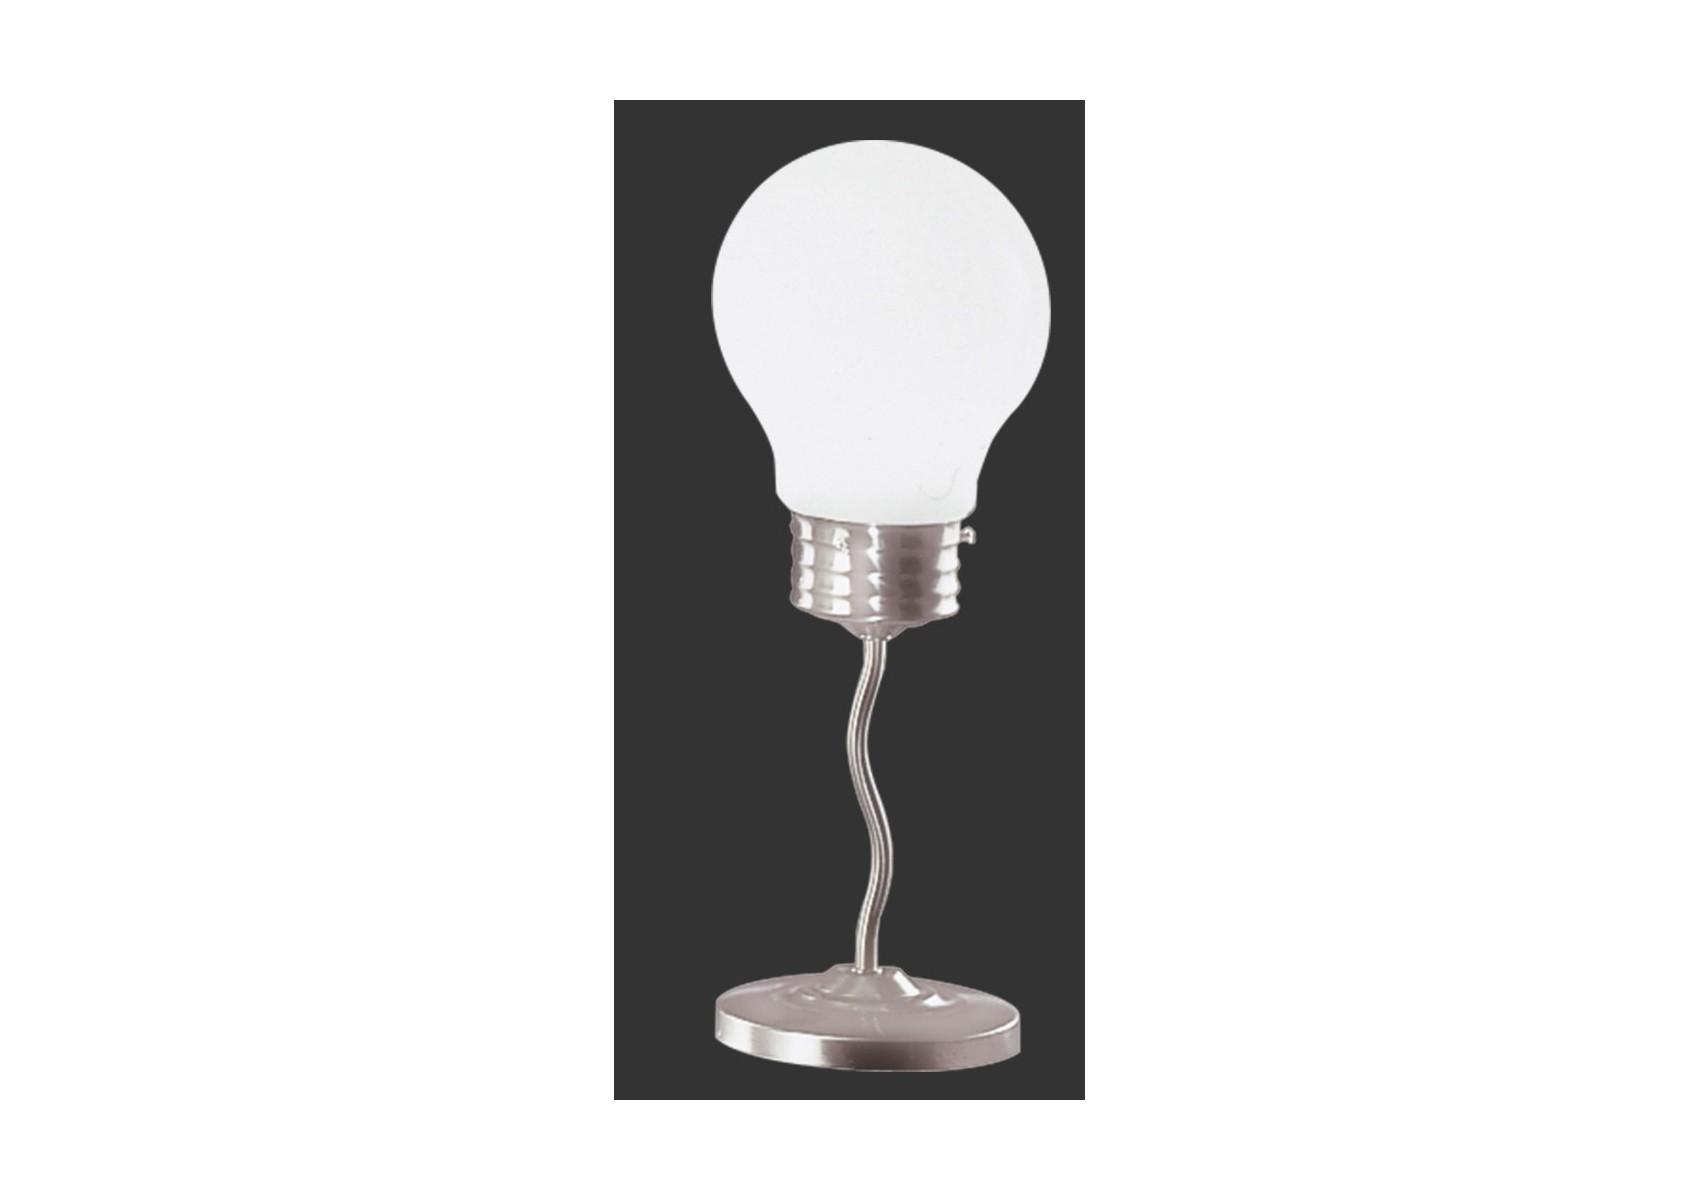 lampe poser design edison ampoule boite design. Black Bedroom Furniture Sets. Home Design Ideas